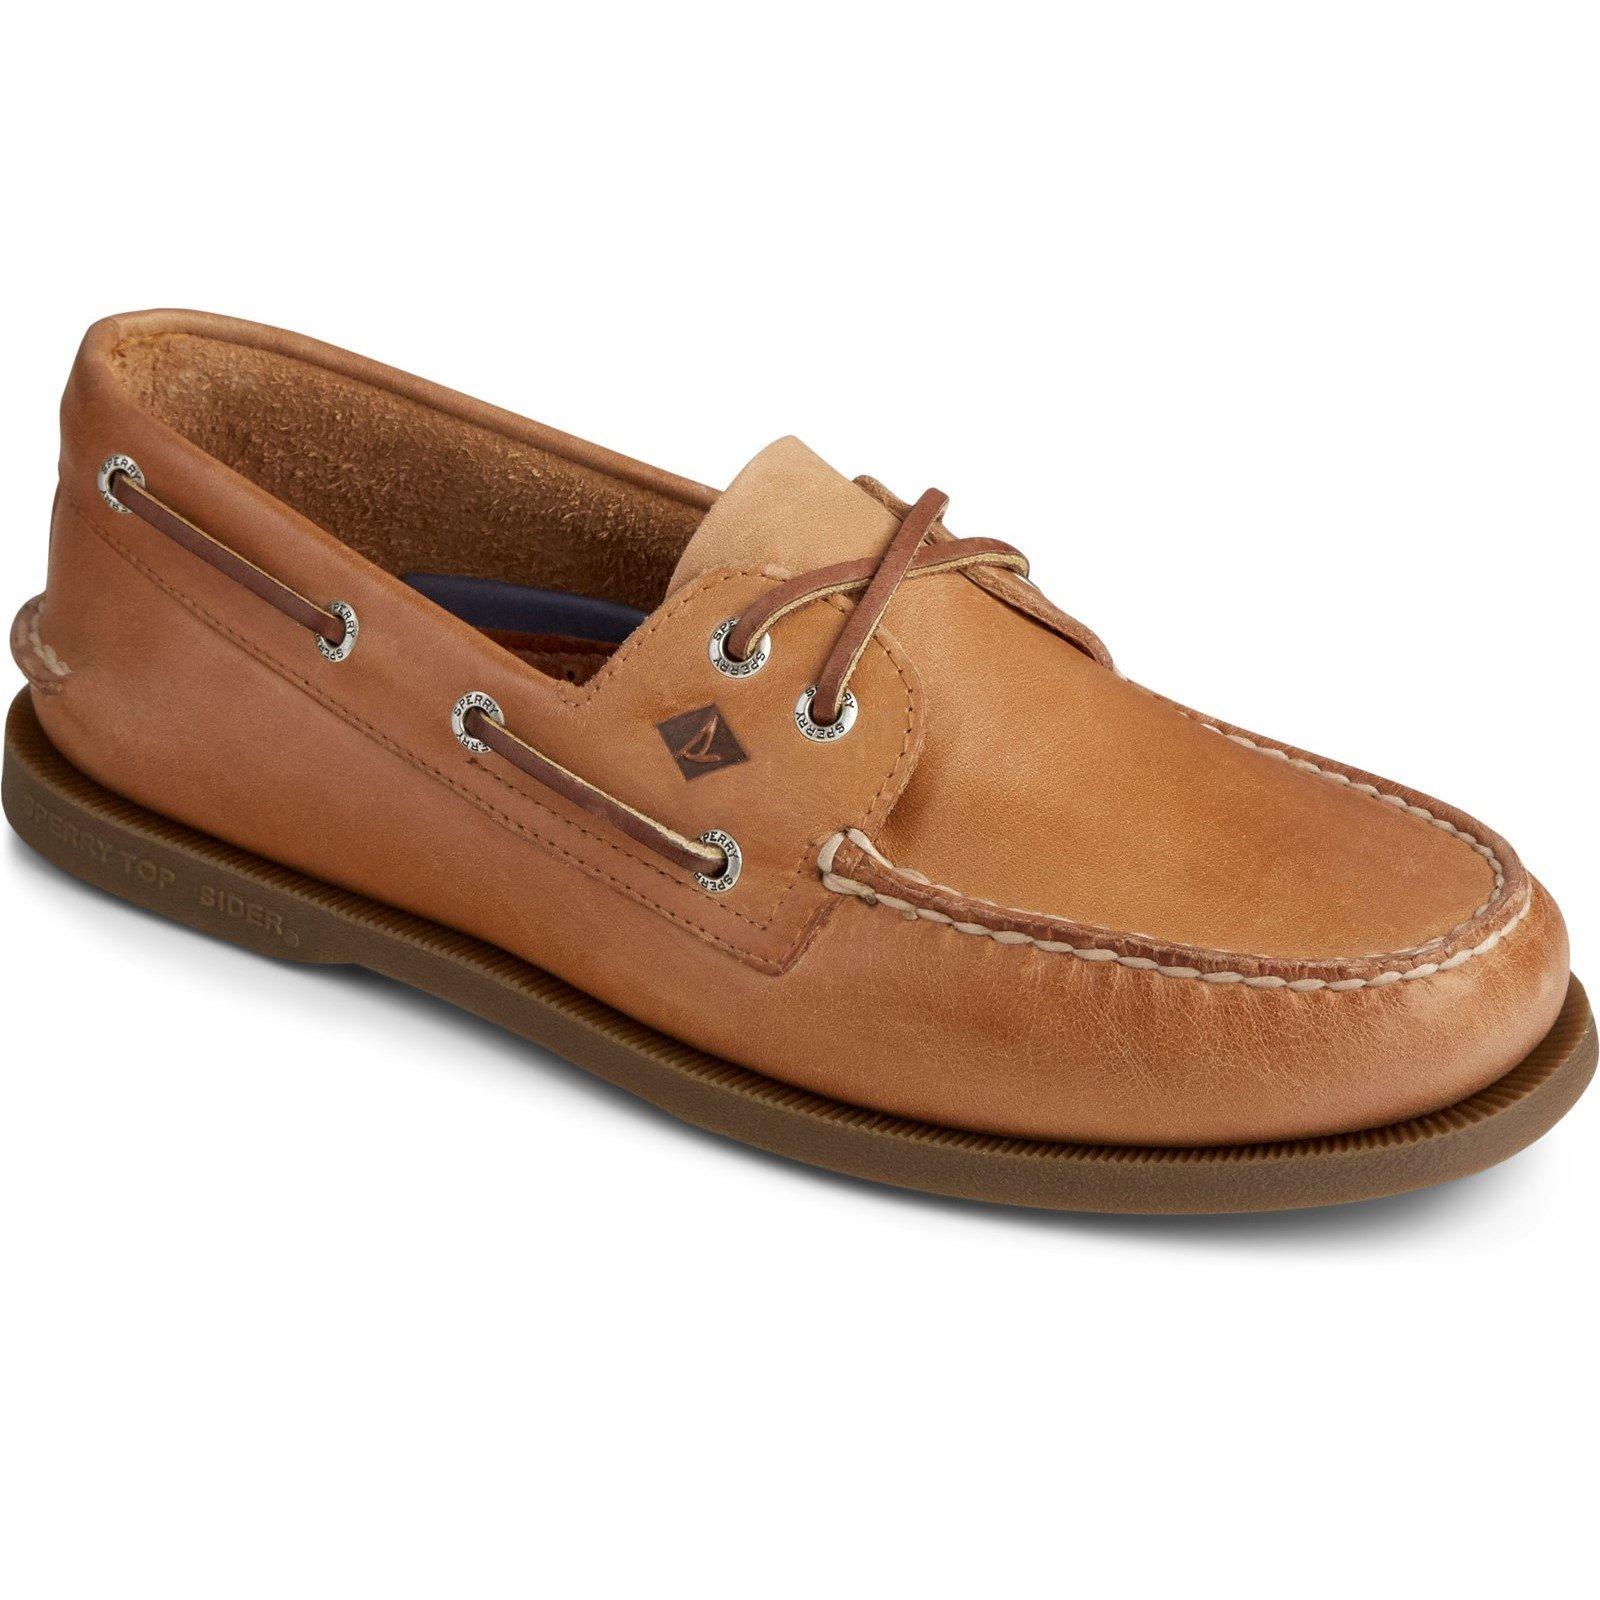 Sperry Men's Authentic Original Leather Boat Shoe Various Colours 31524 - Nutmeg 13